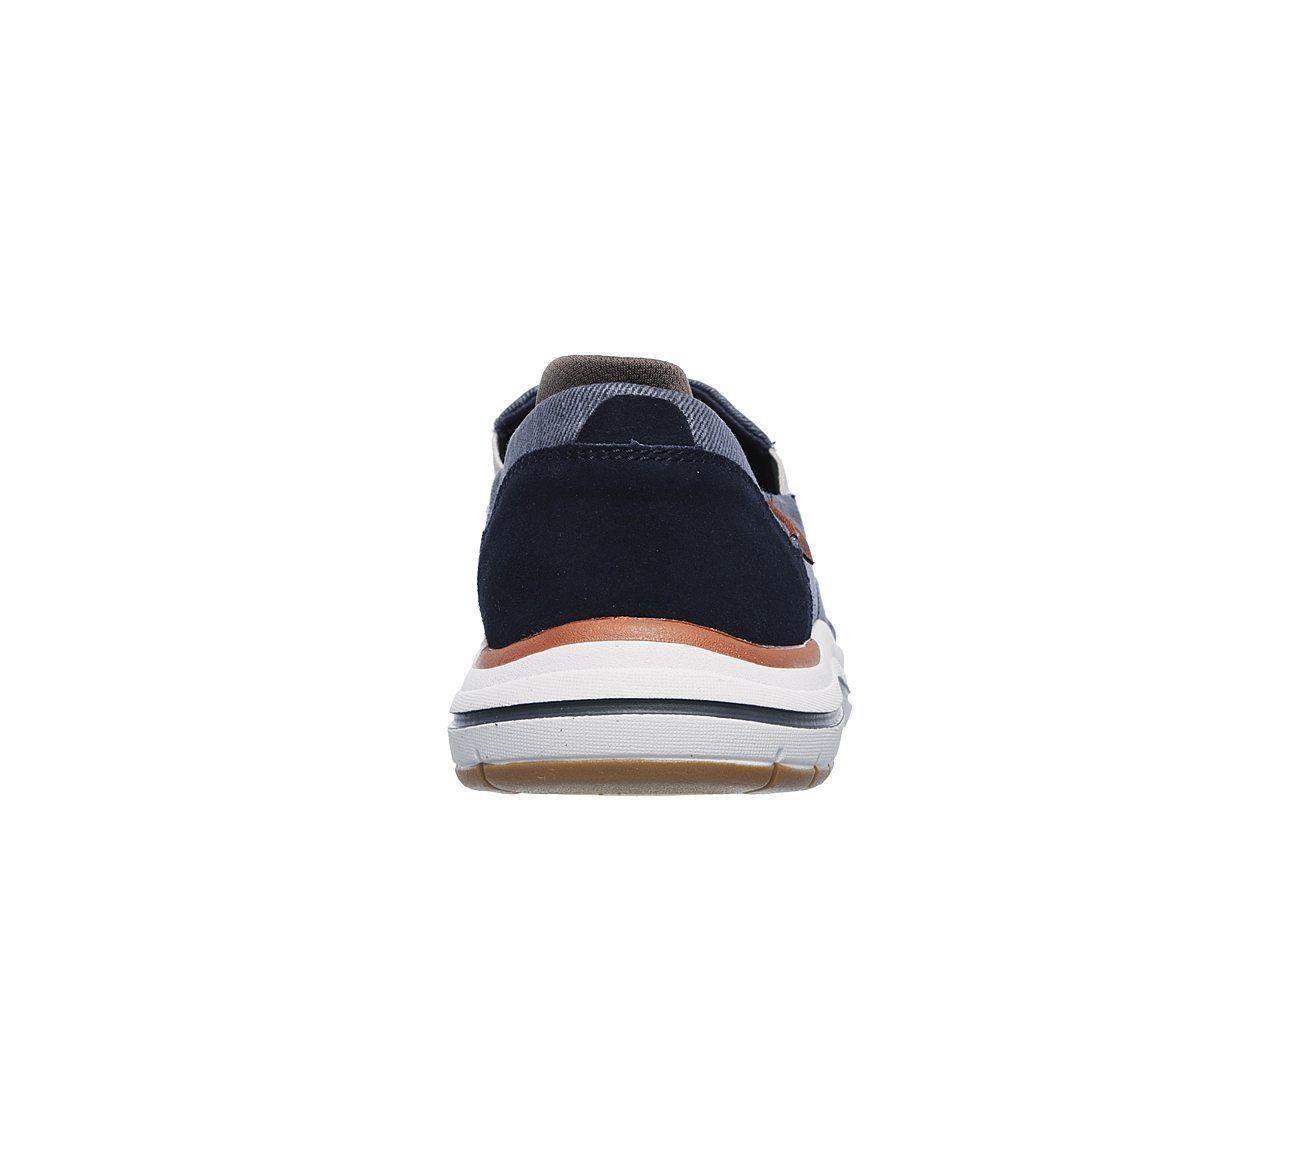 Brown Black Skechers Shoes Wide Fit Men Memory Foam Comfort